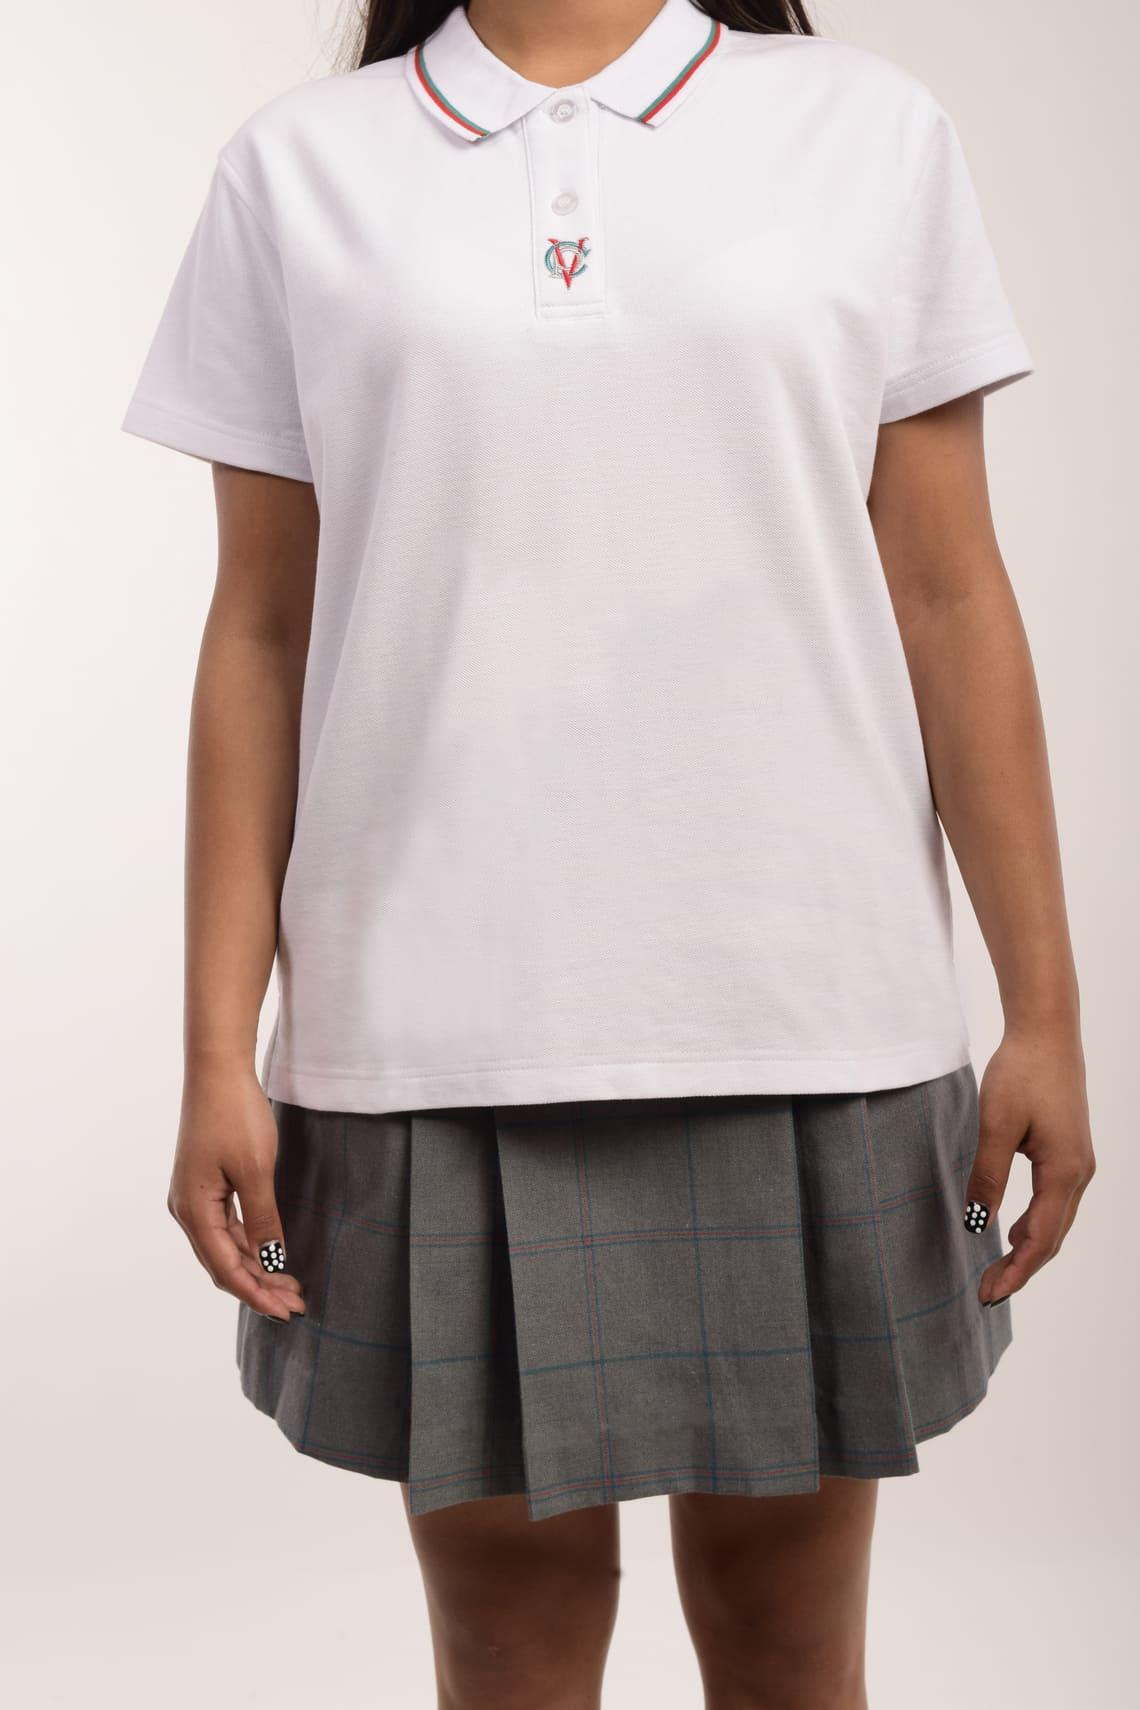 Polera Pique M/C Mujer (S - XL)